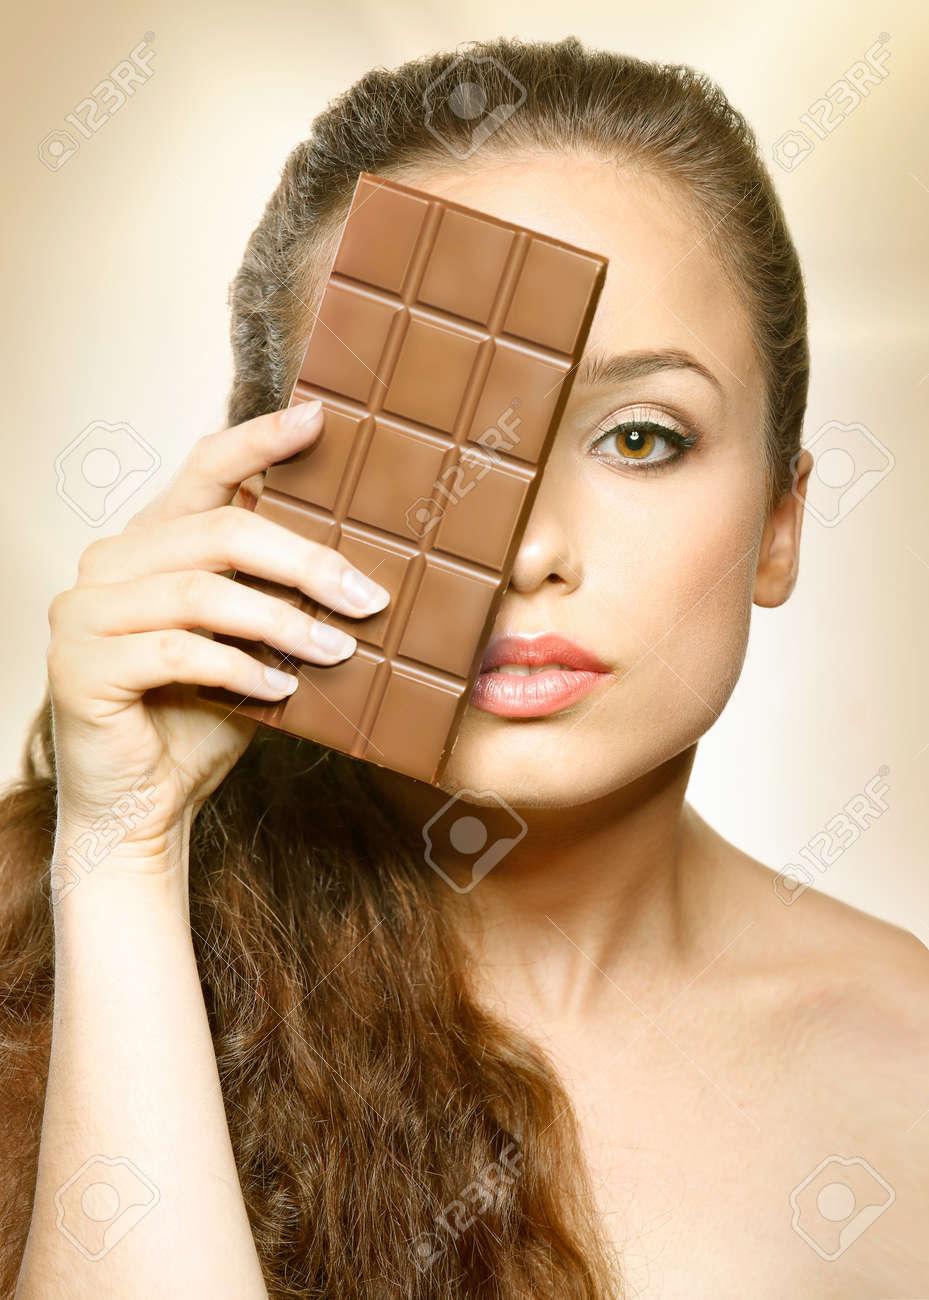 Chocolate Beautiful Girl Looking Behind Chocolate, Woman Model ...